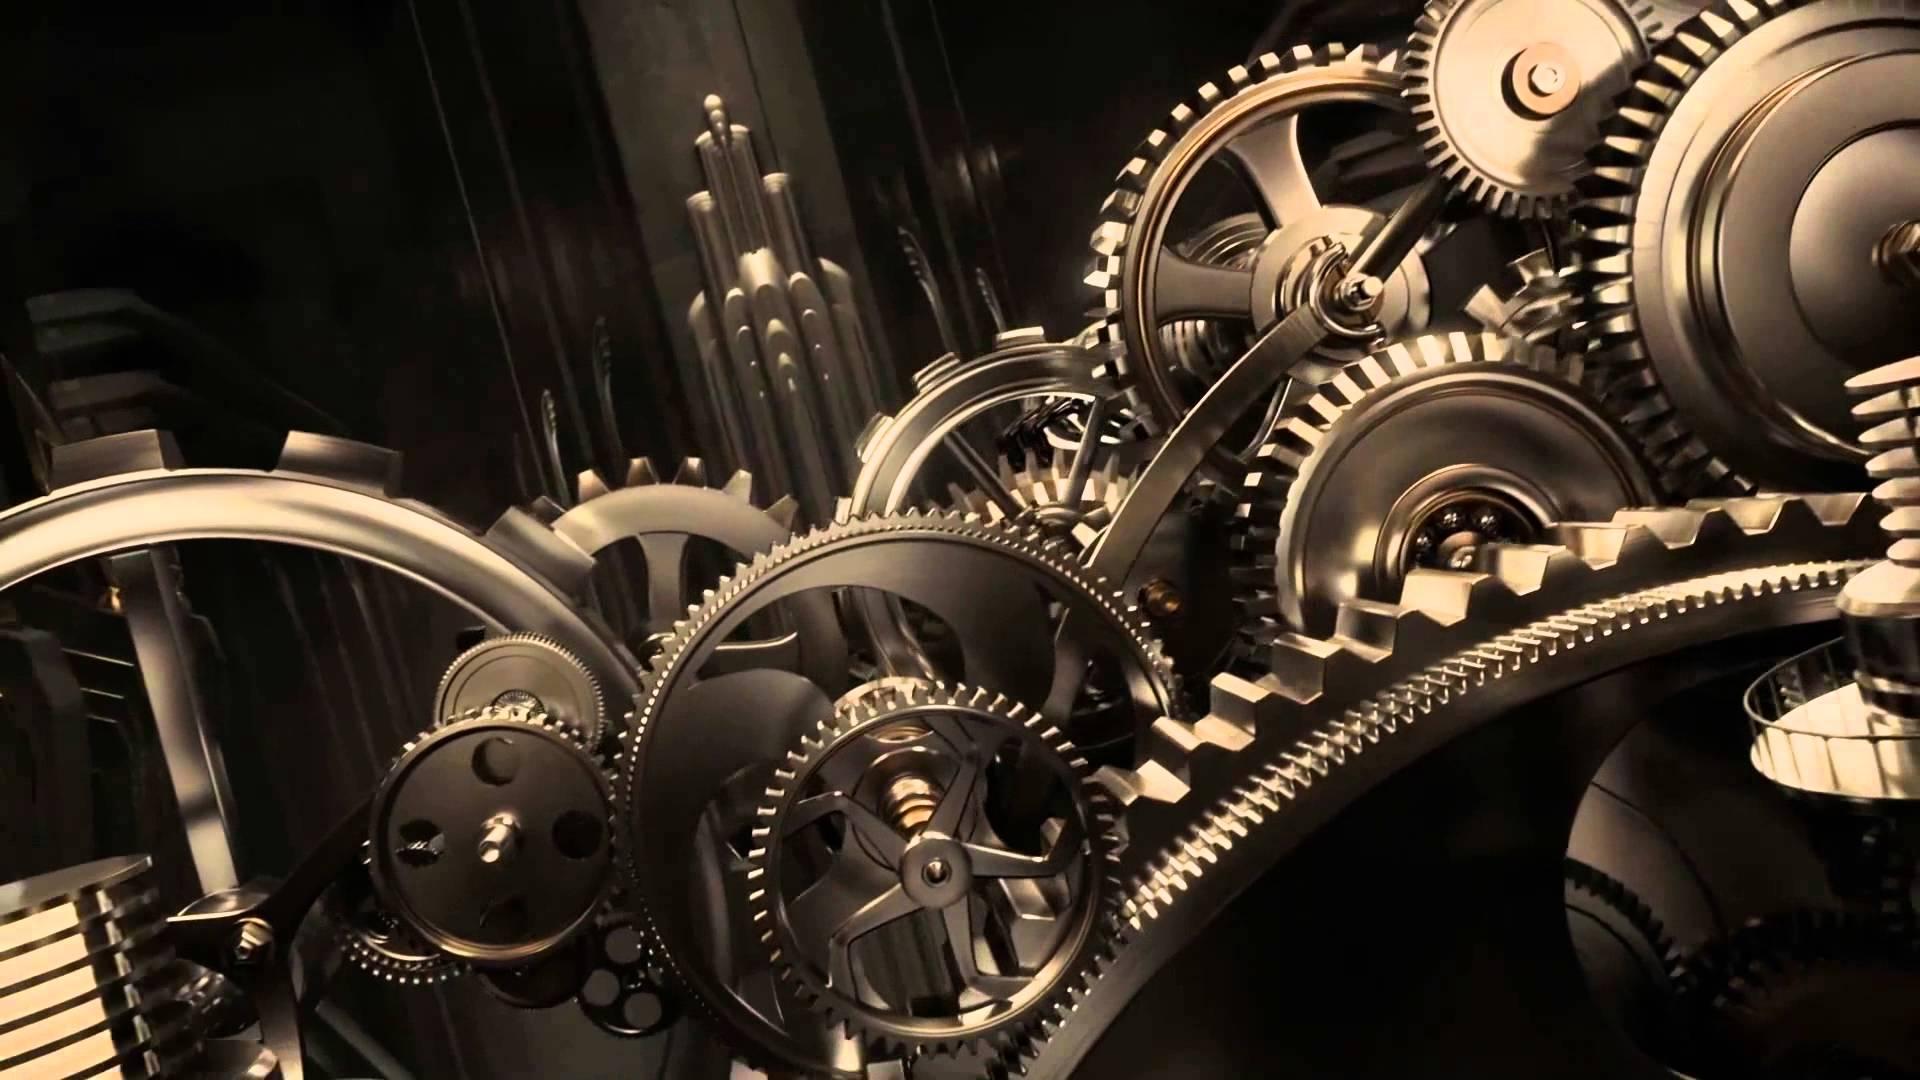 Mechanical Engineering Logo Wallpaper Mechanical eng 1920x1080